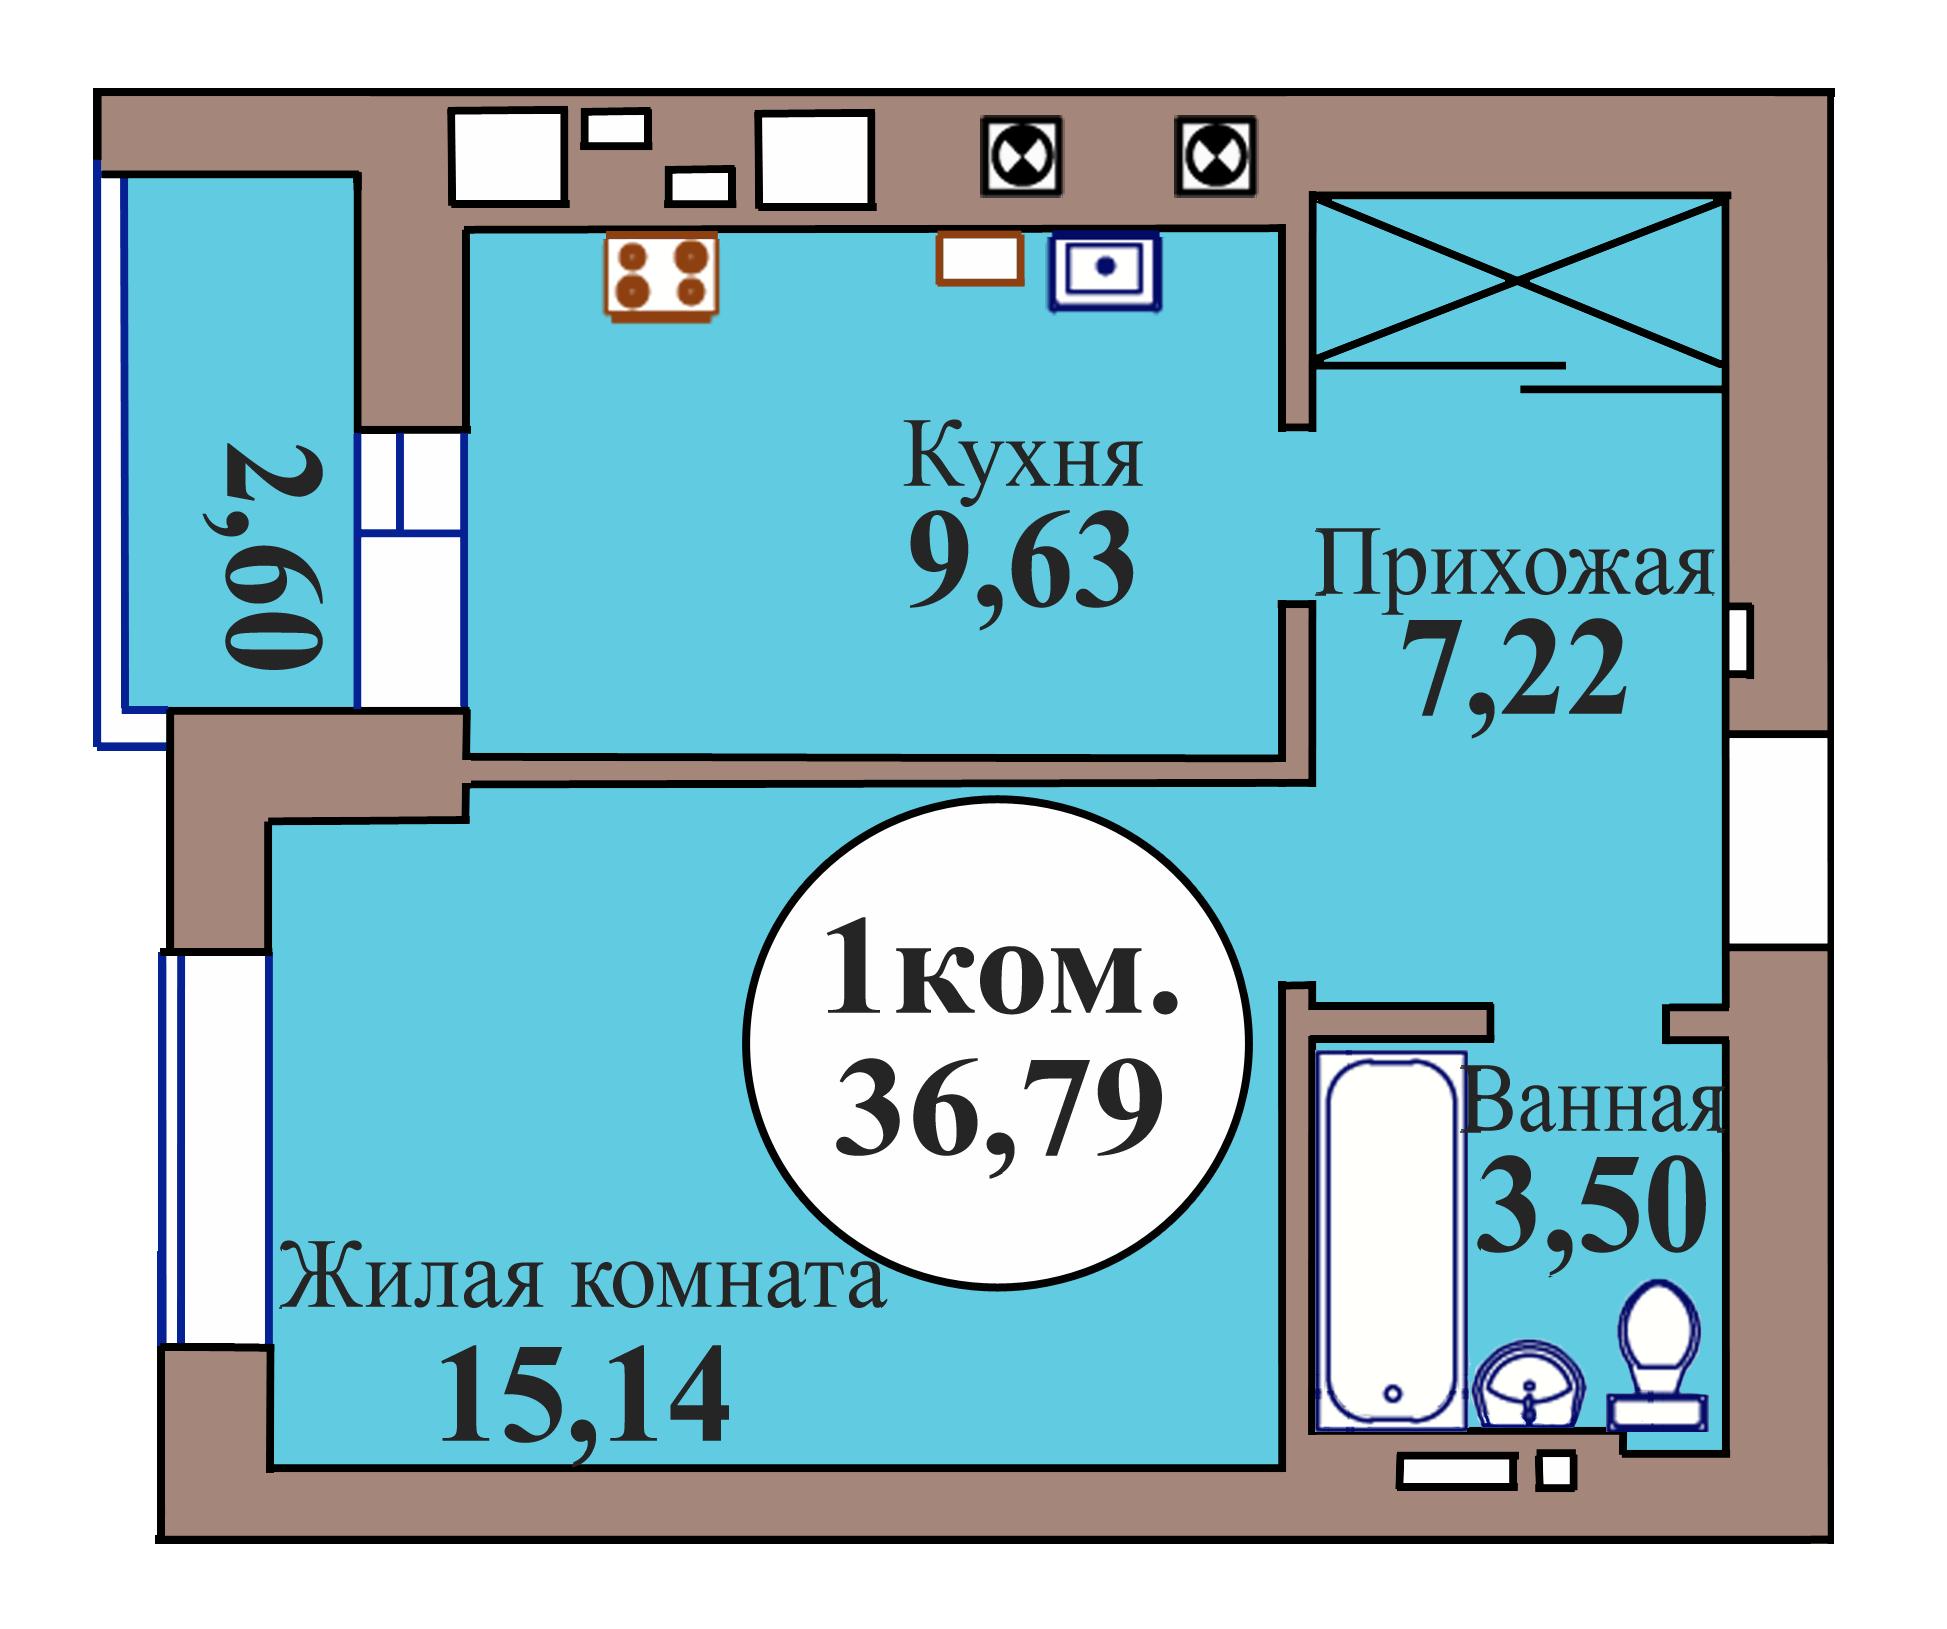 1-комн. кв. по пер. Калининградский, 5 кв. 68 в Калининграде